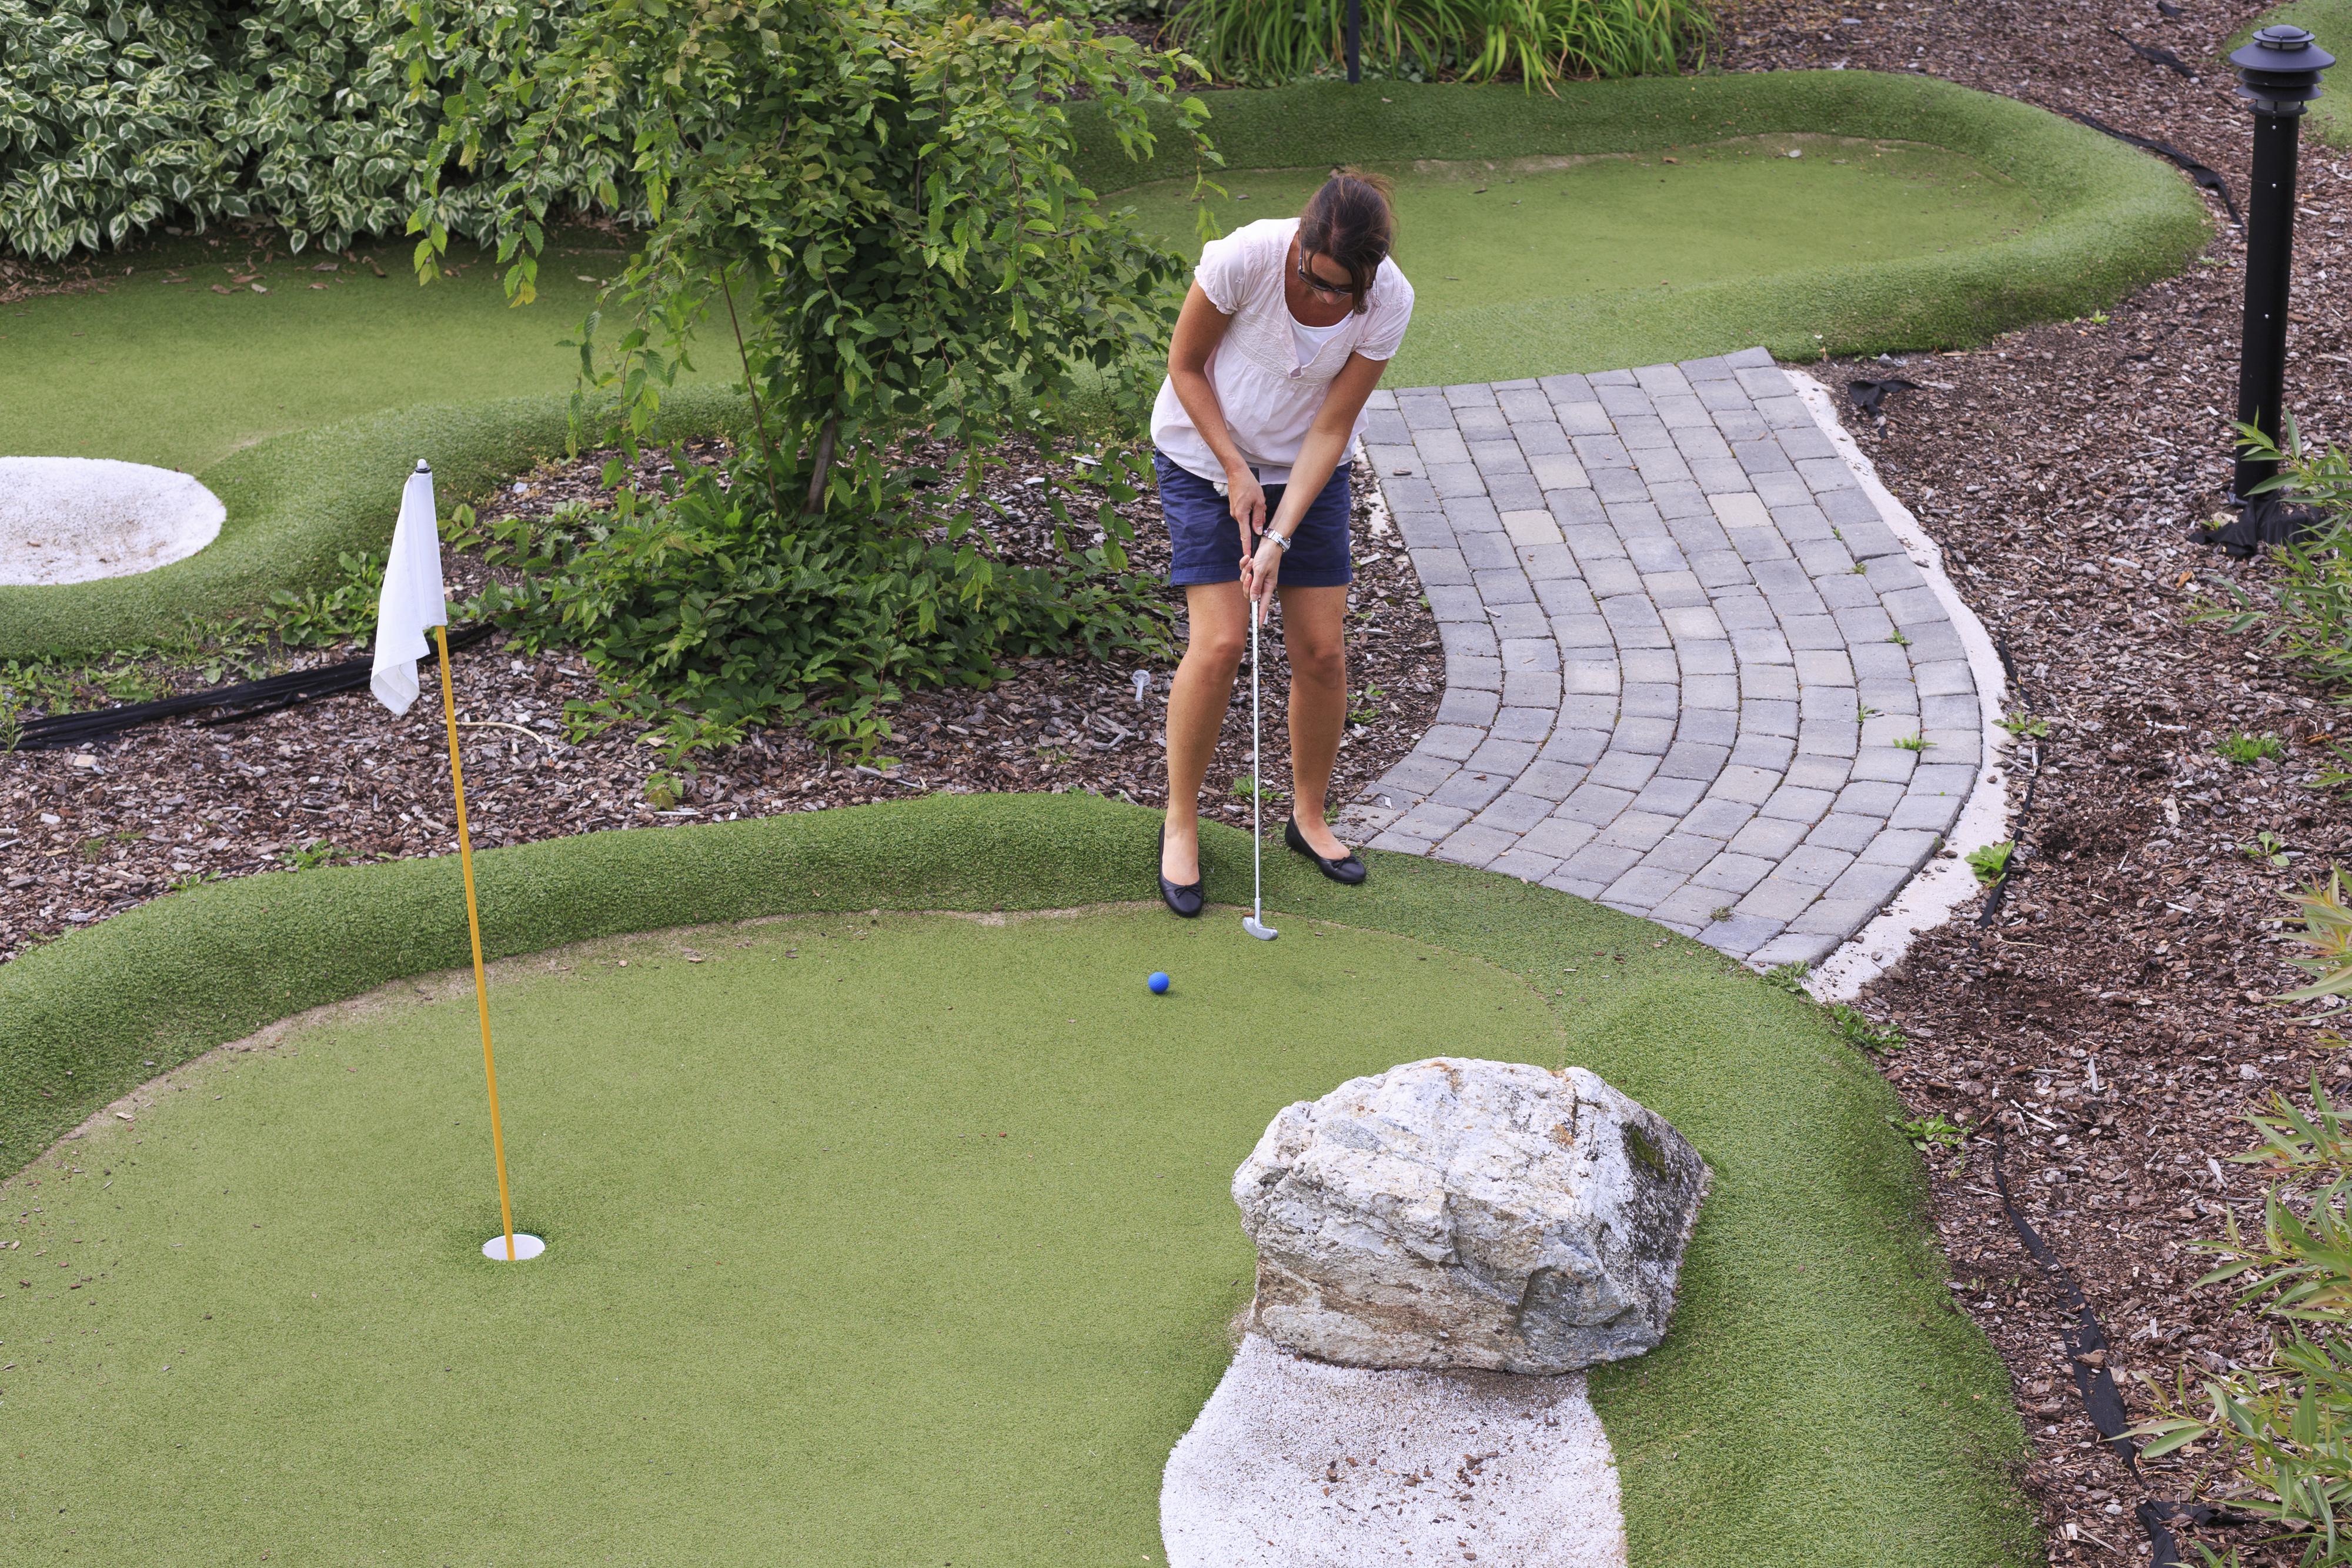 Women playing miniature golf